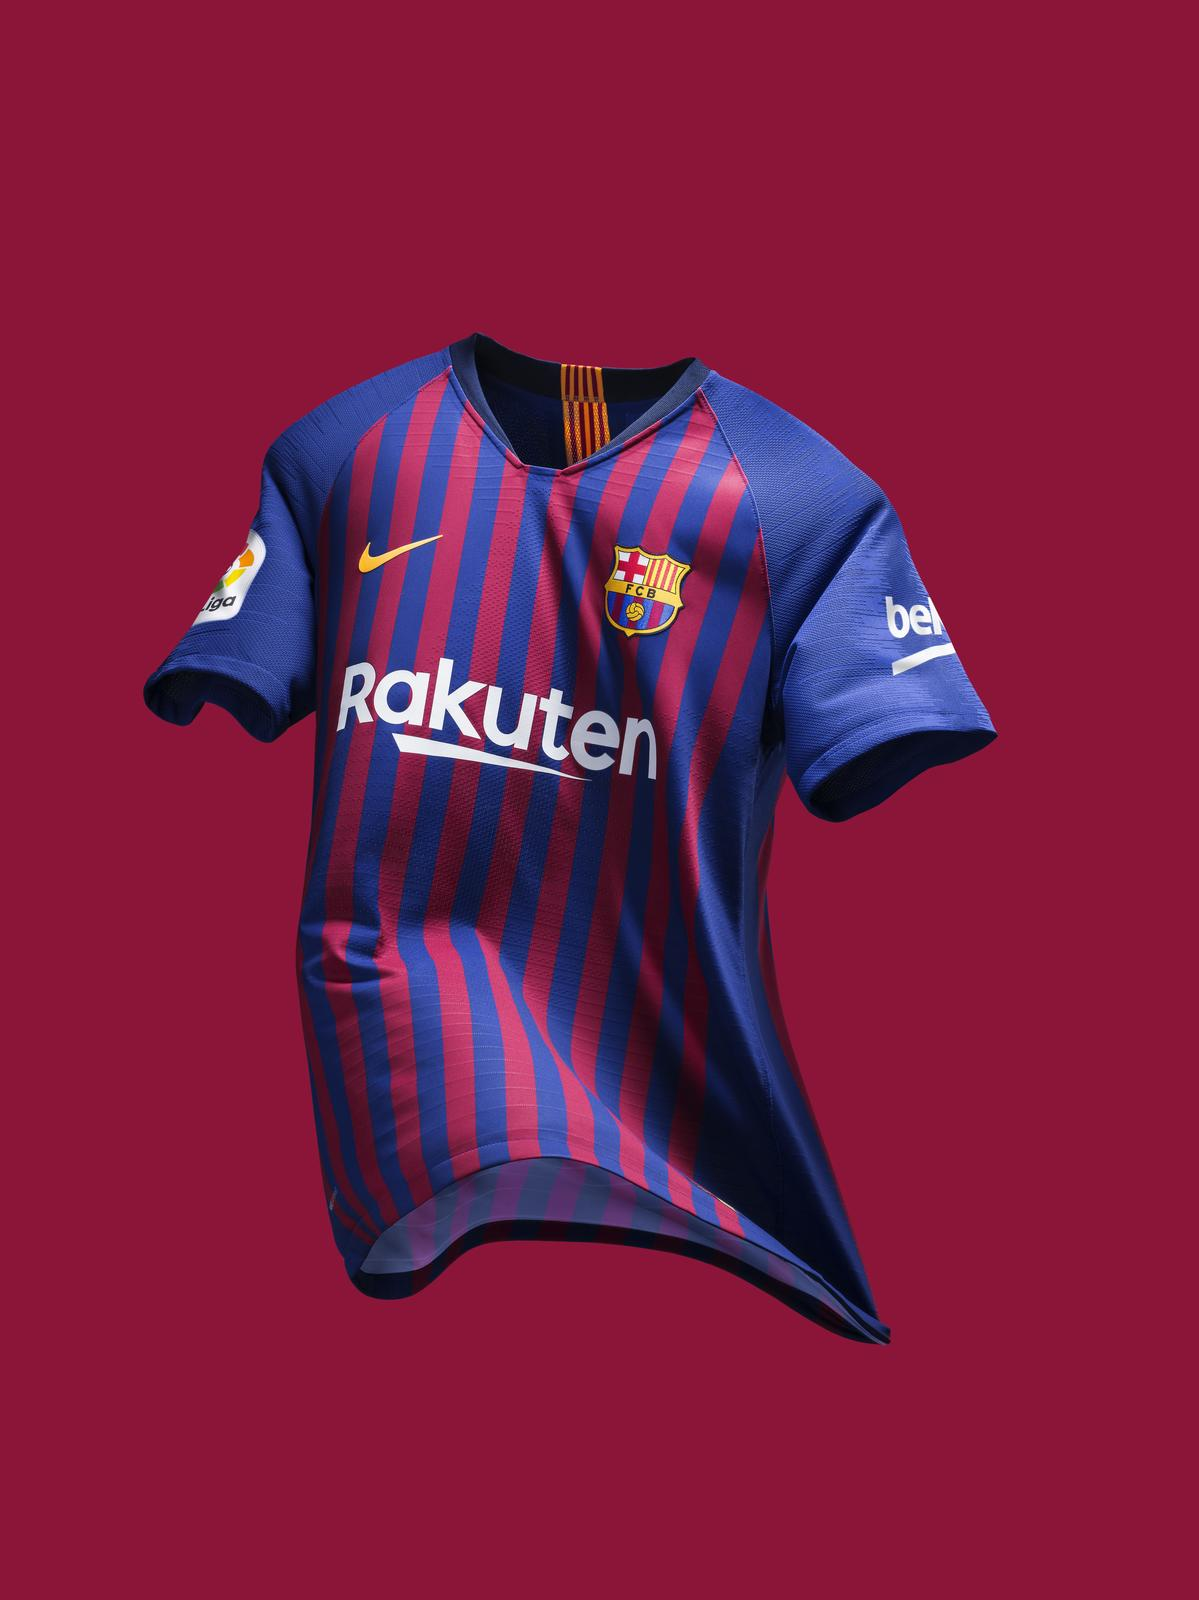 on sale 23432 f43c6 Chile's Arturo Vidal leaves Bayern Munich for FC Barcelona!